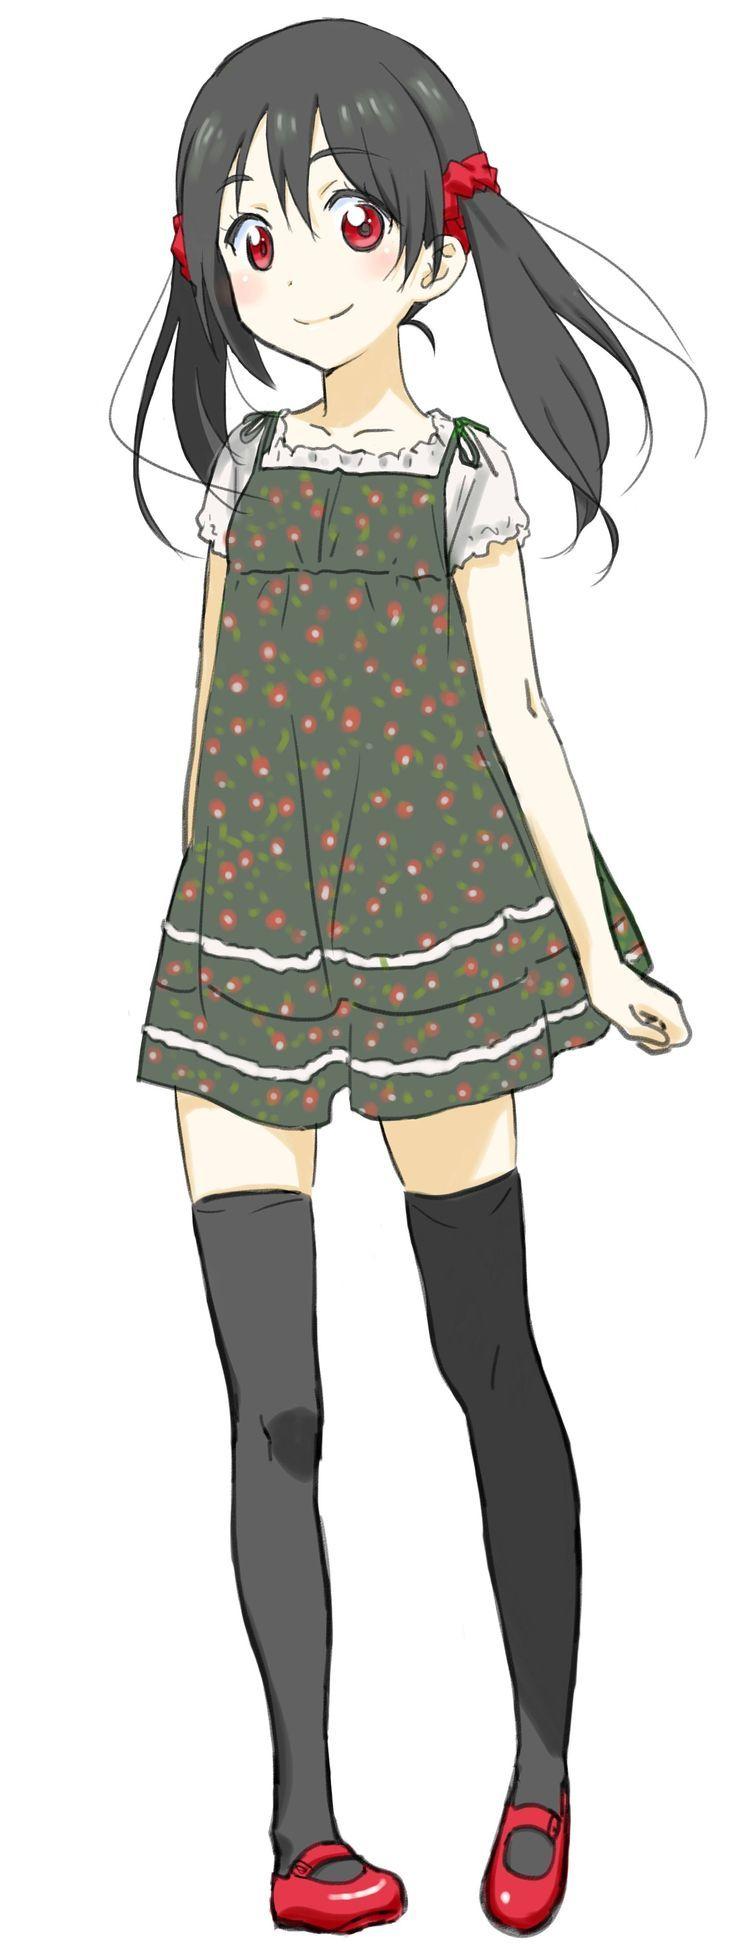 Tải hinh anime Cute girl 506 avatar 1 tấm Ảnh